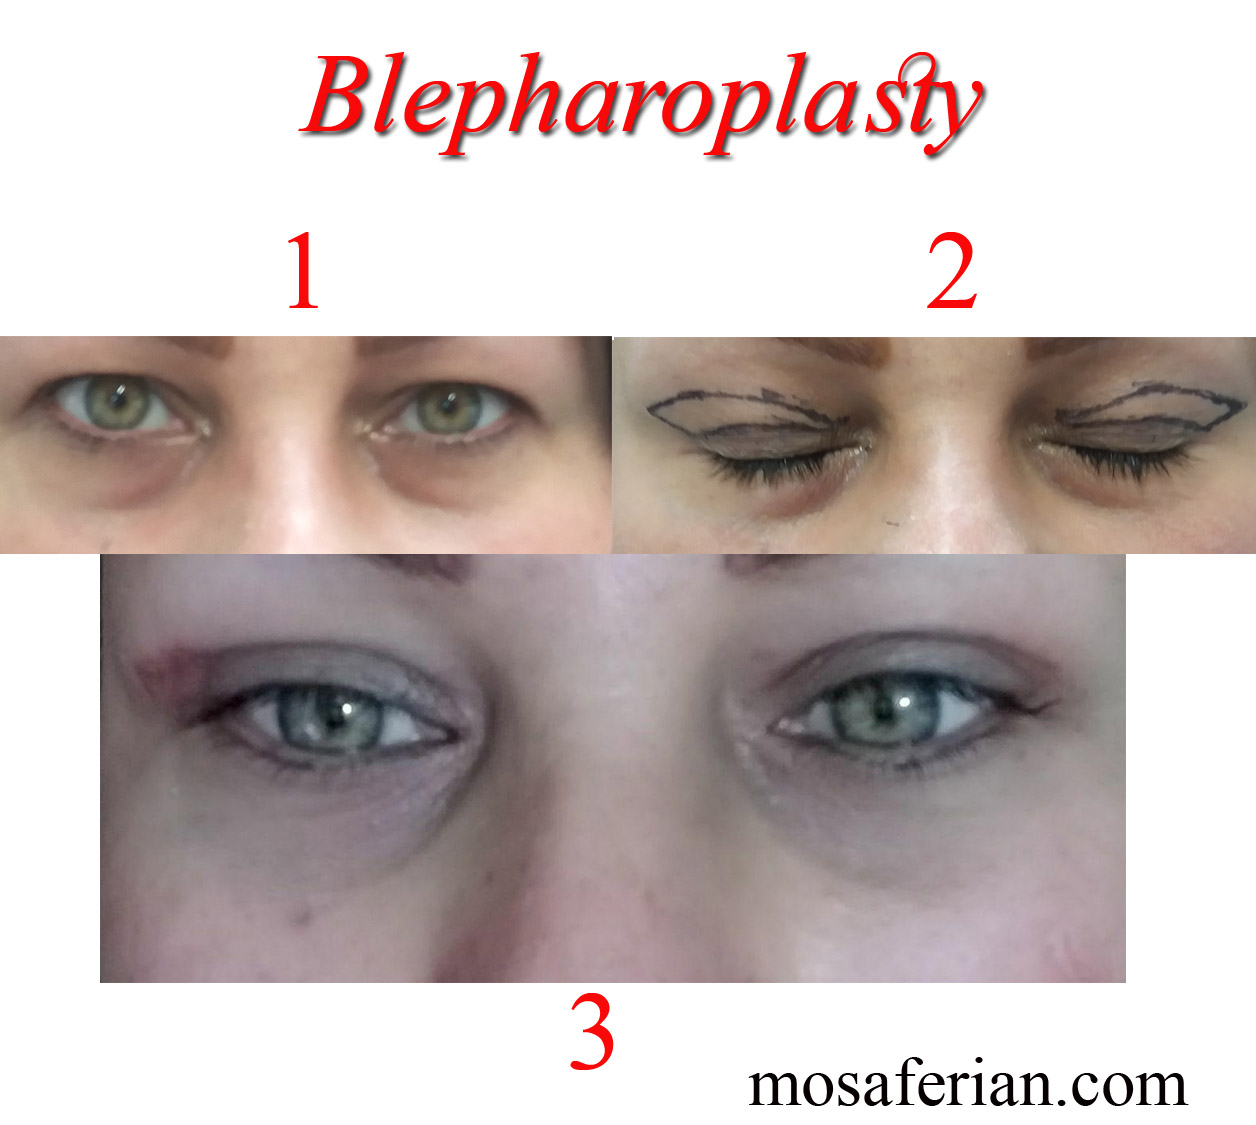 double eyelid surgery - Niayesh Beauty Clinic Double eyelid